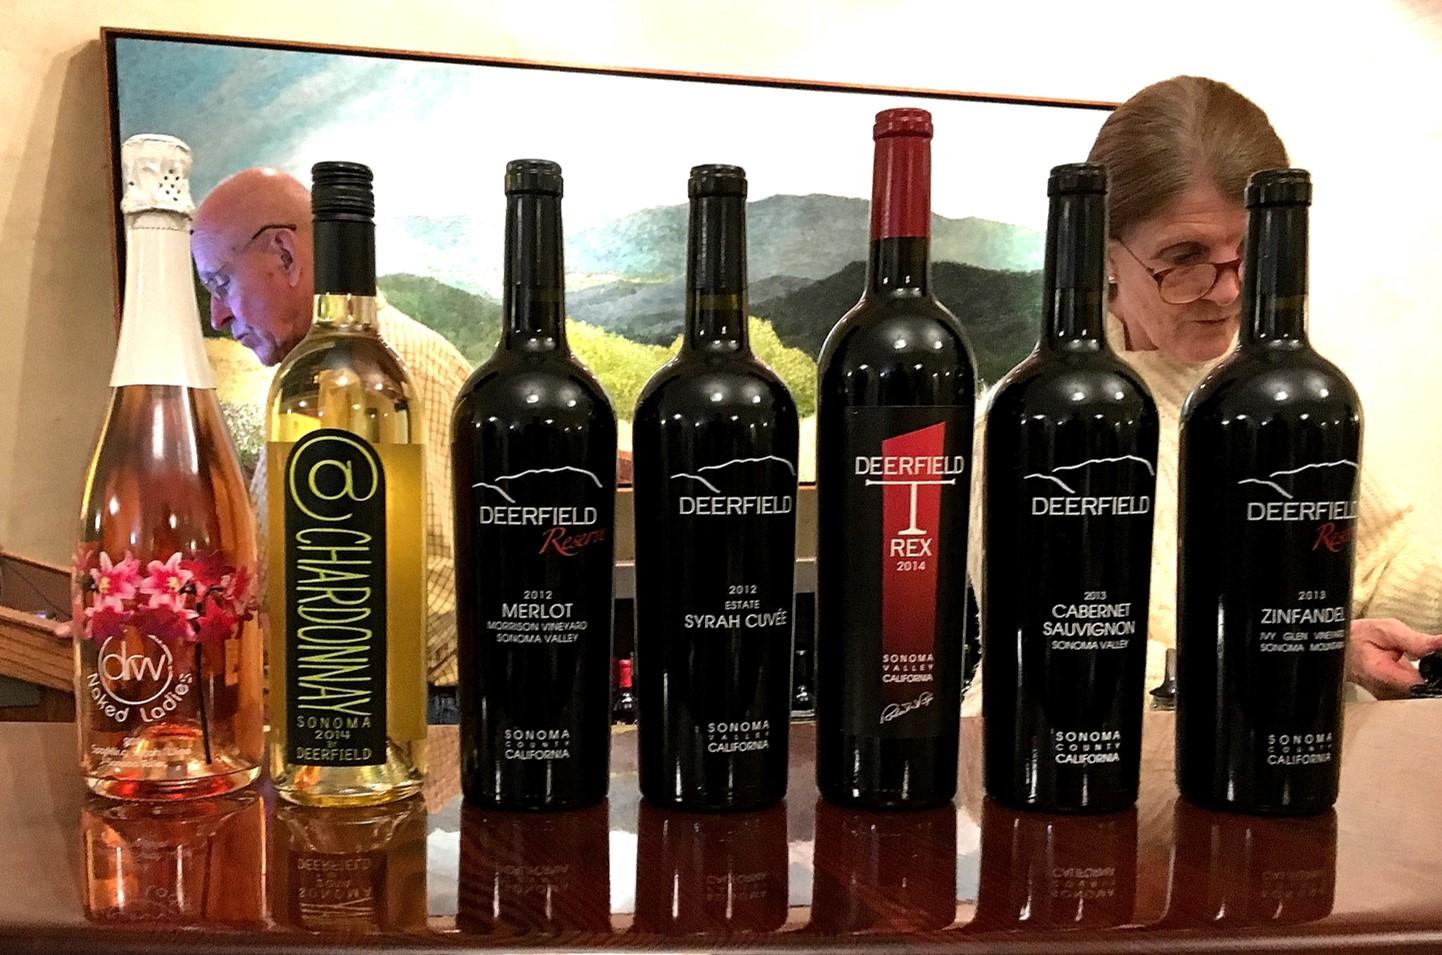 Deerfield Ranch Winery tasting flight